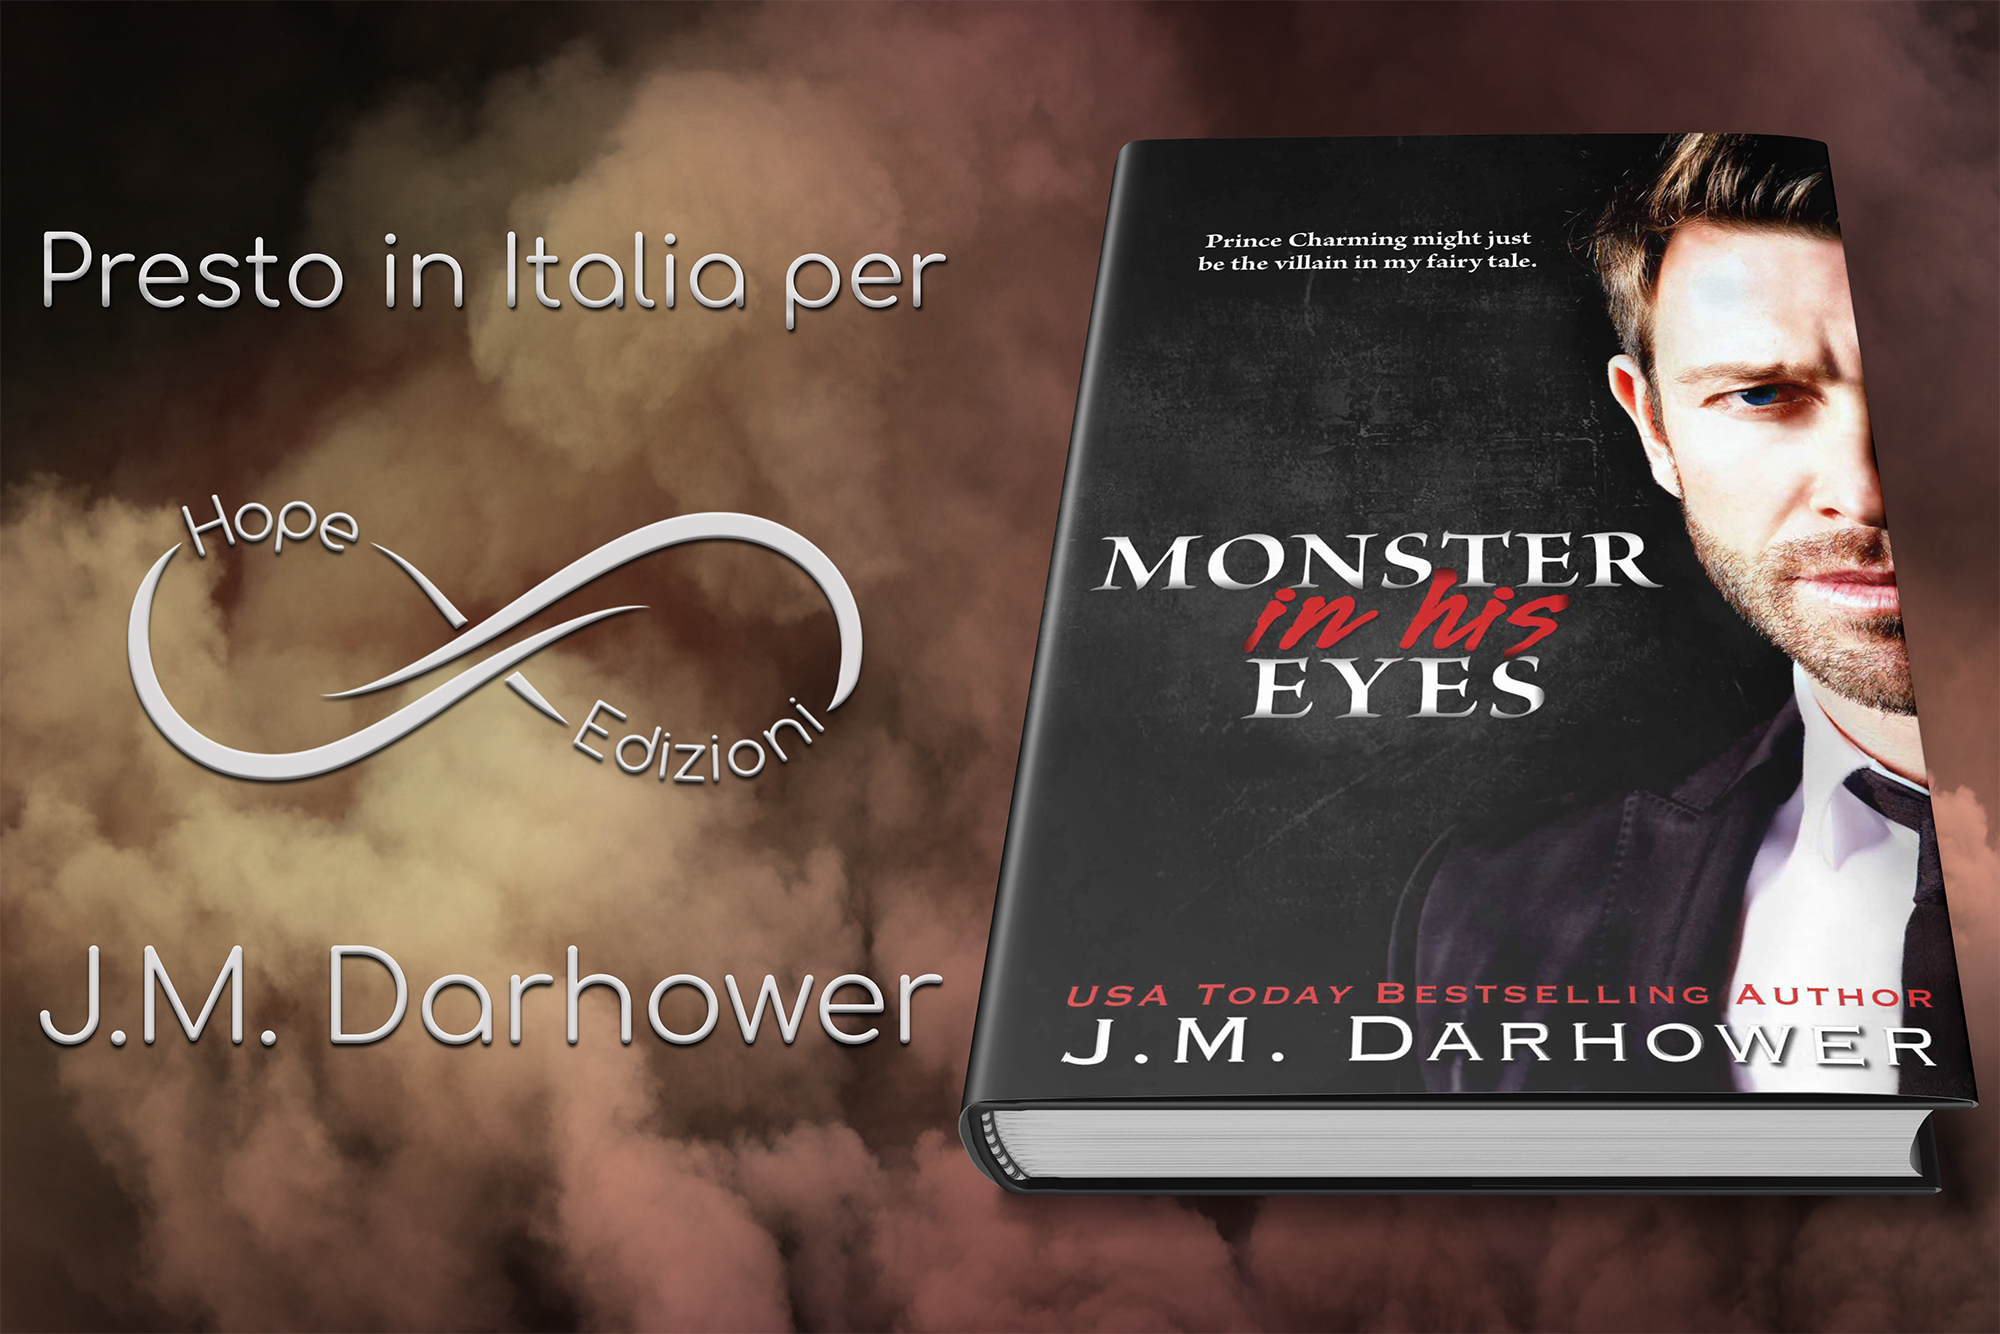 Arriva in Italia… J.M. Darhower!